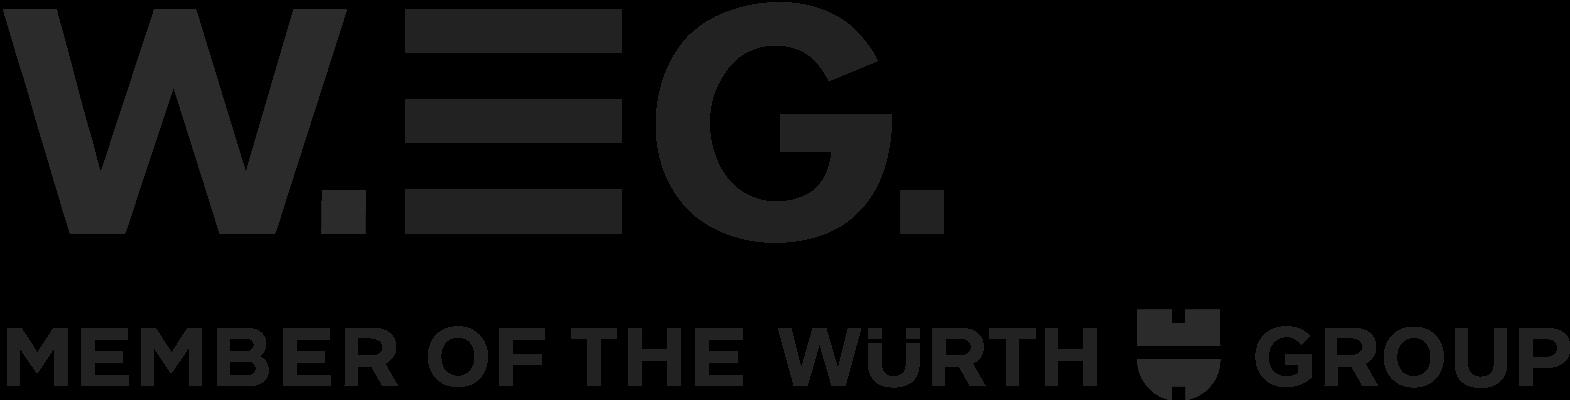 weg-logo-ConvertImage (1)